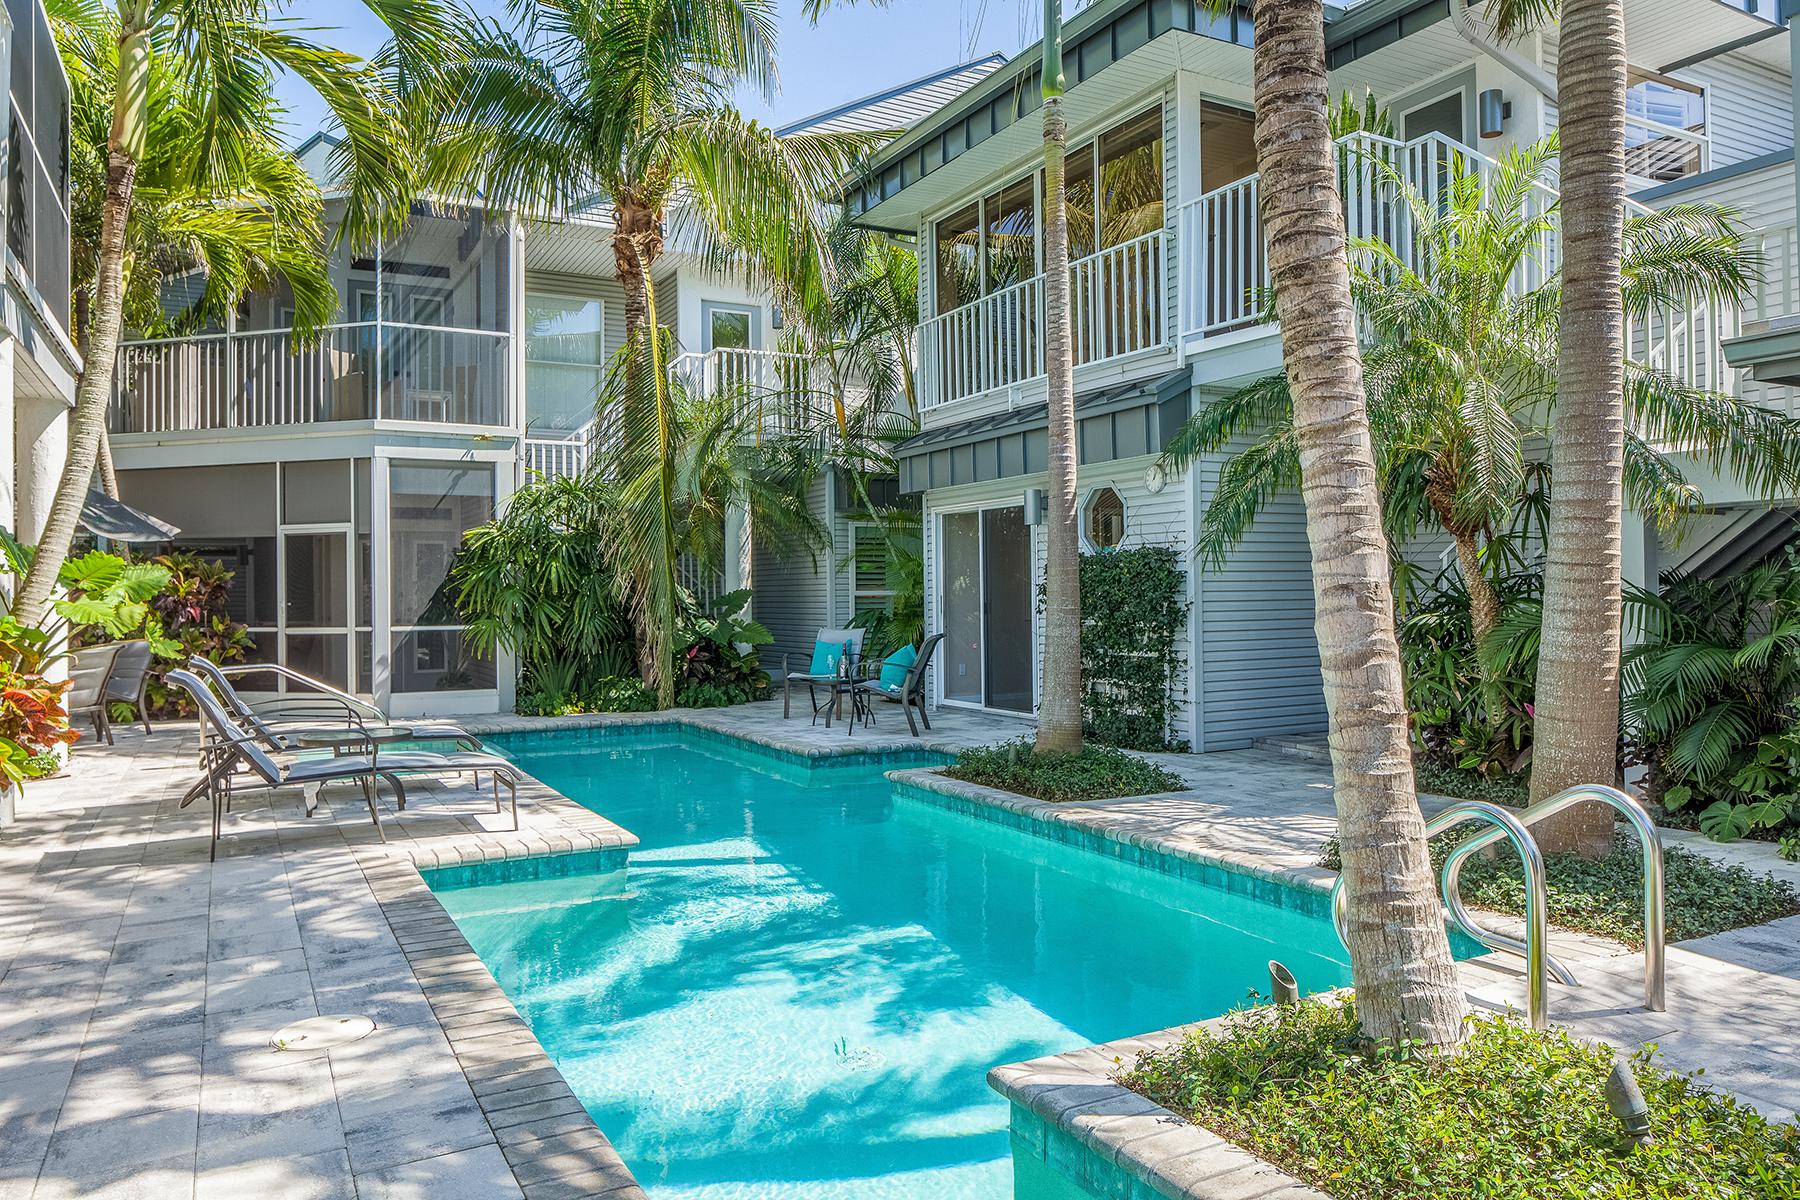 Condomínio para Venda às OLDE NAPLES - STONE'S THROW 353 2nd St S 2-353, Old Naples, Naples, Florida, 34102 Estados Unidos